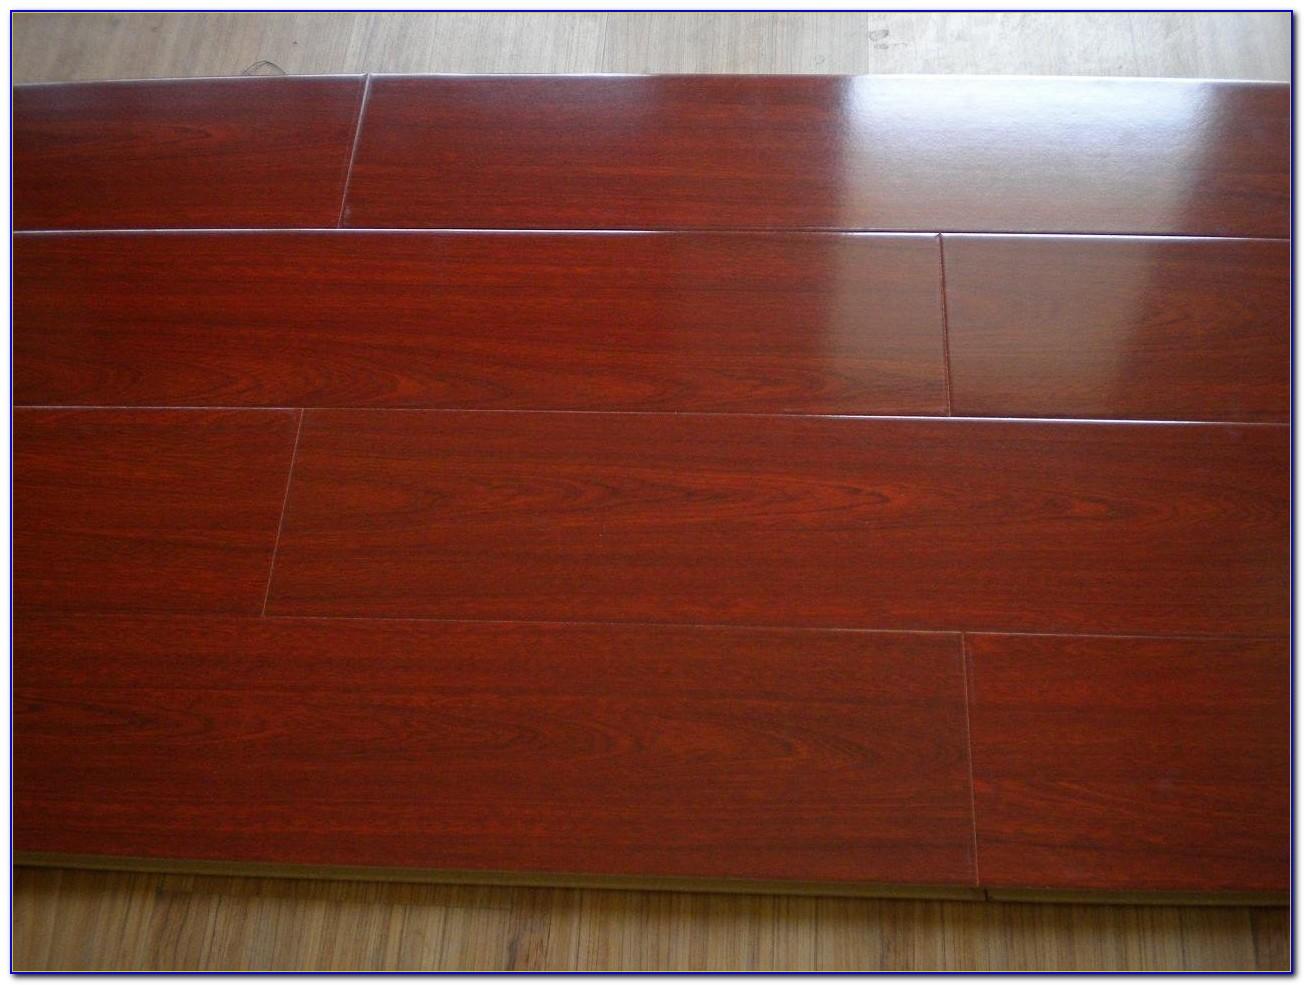 High Gloss Laminate Flooring Cleaning